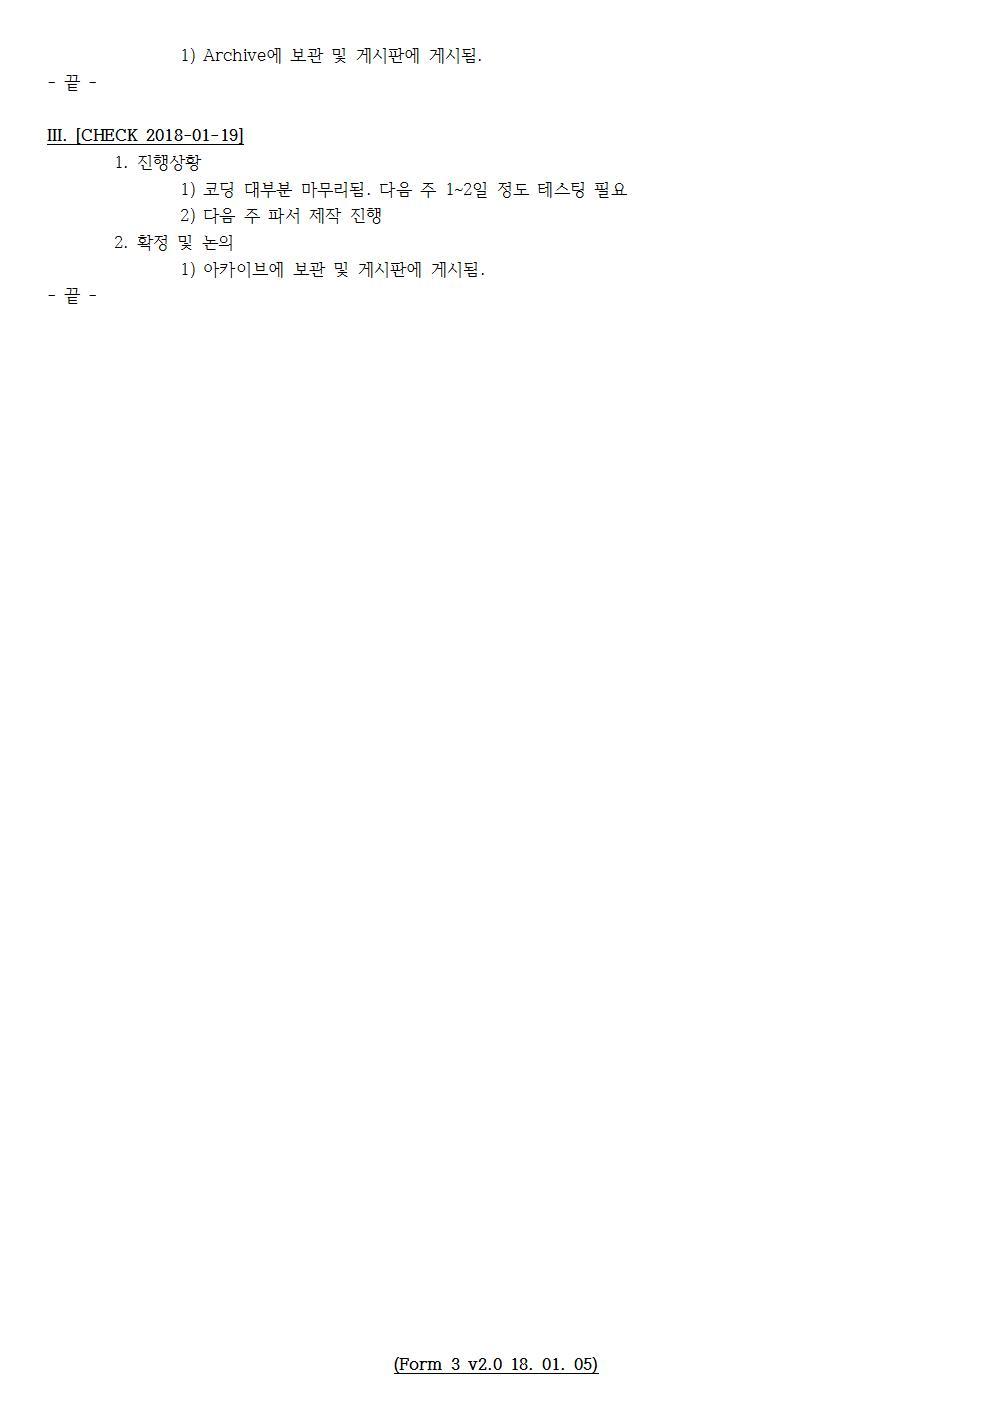 D-[18-001-RD-01]-[SAVE 3.0]-[2018-01-19][SH]002.jpg